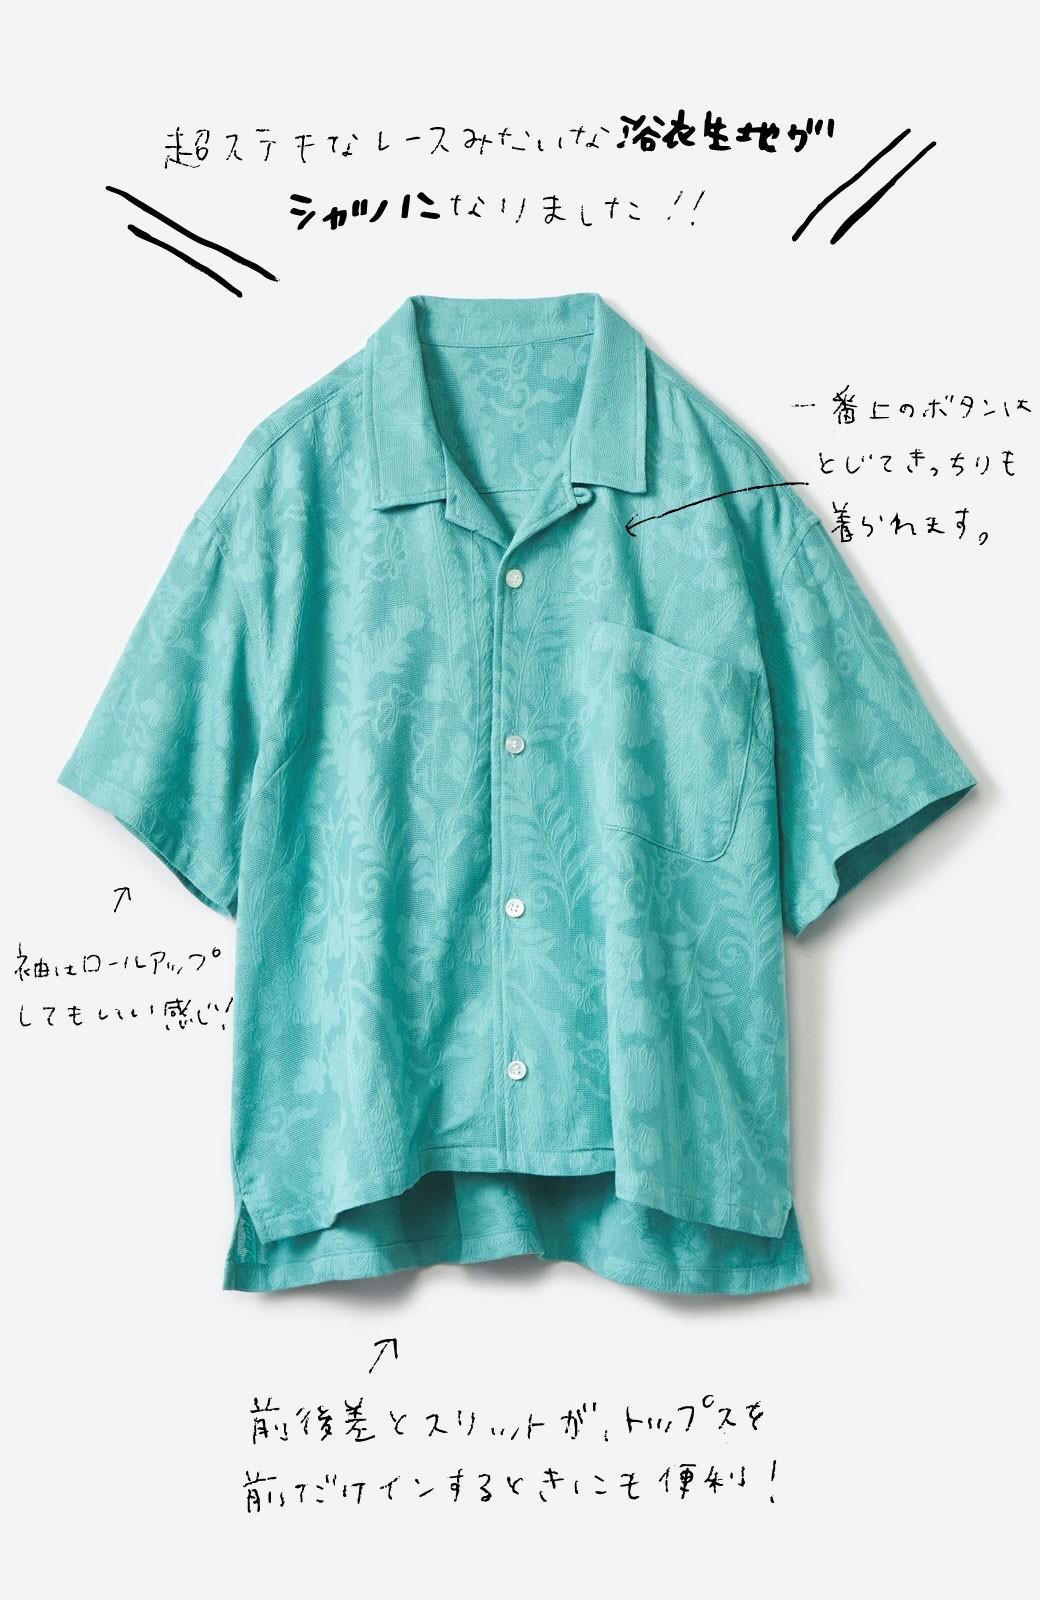 haco! 【今年も再販!】京都の浴衣屋さんと作った浴衣生地のシャツ <グリーン>の商品写真2